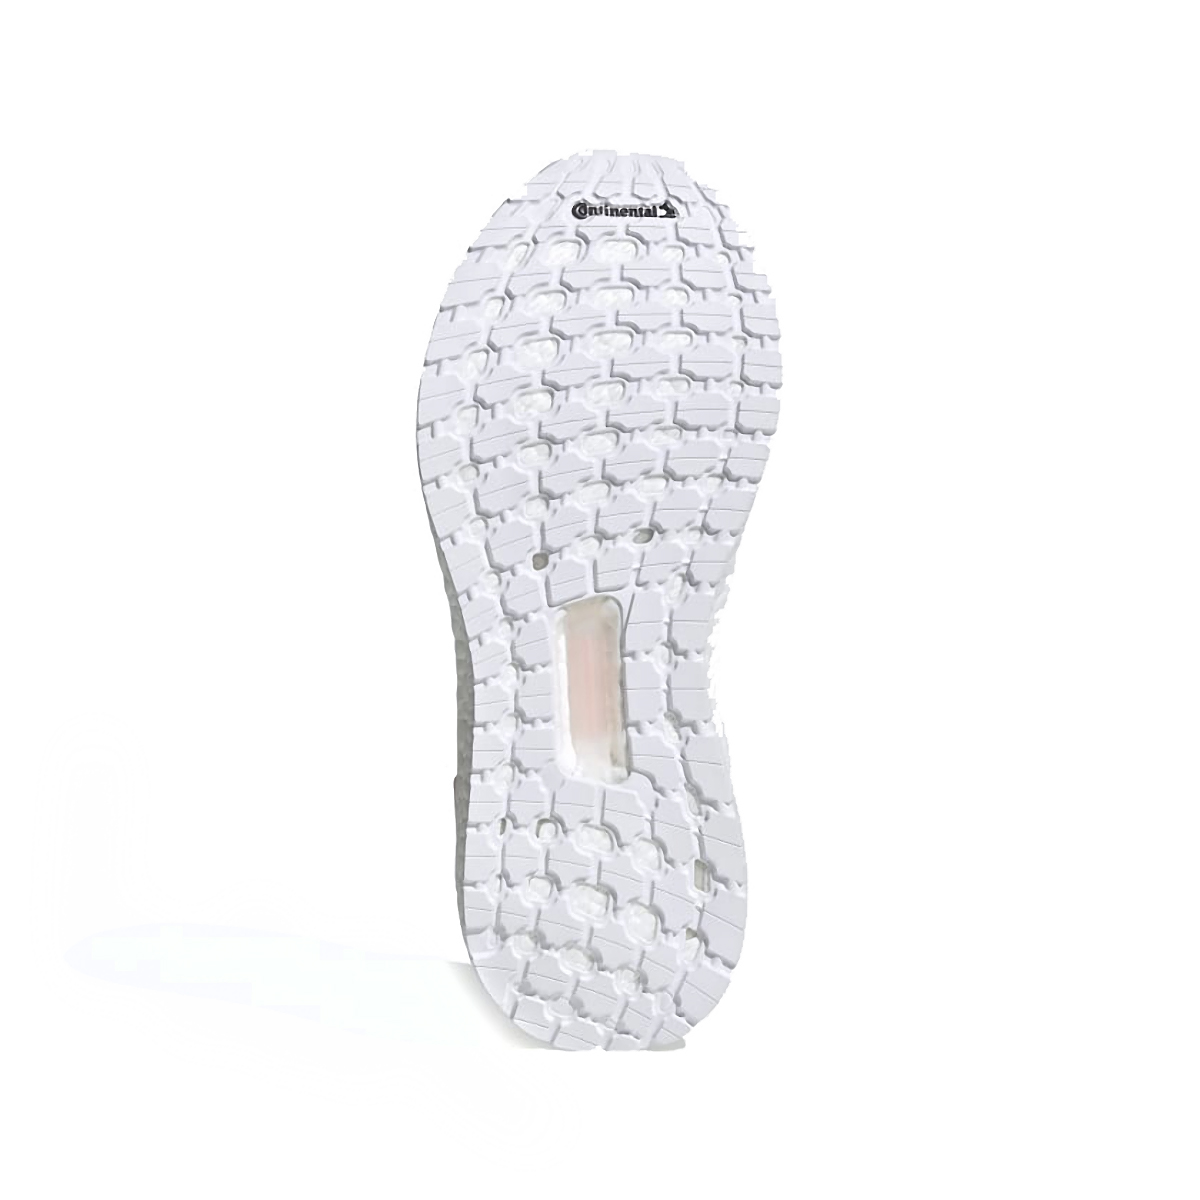 Women's Adidas Ultraboost 20 Running Shoe - Color: Vapour Pink/Cloud White - Size: 5 - Width: Regular, Vapour Pink/Cloud White, large, image 3